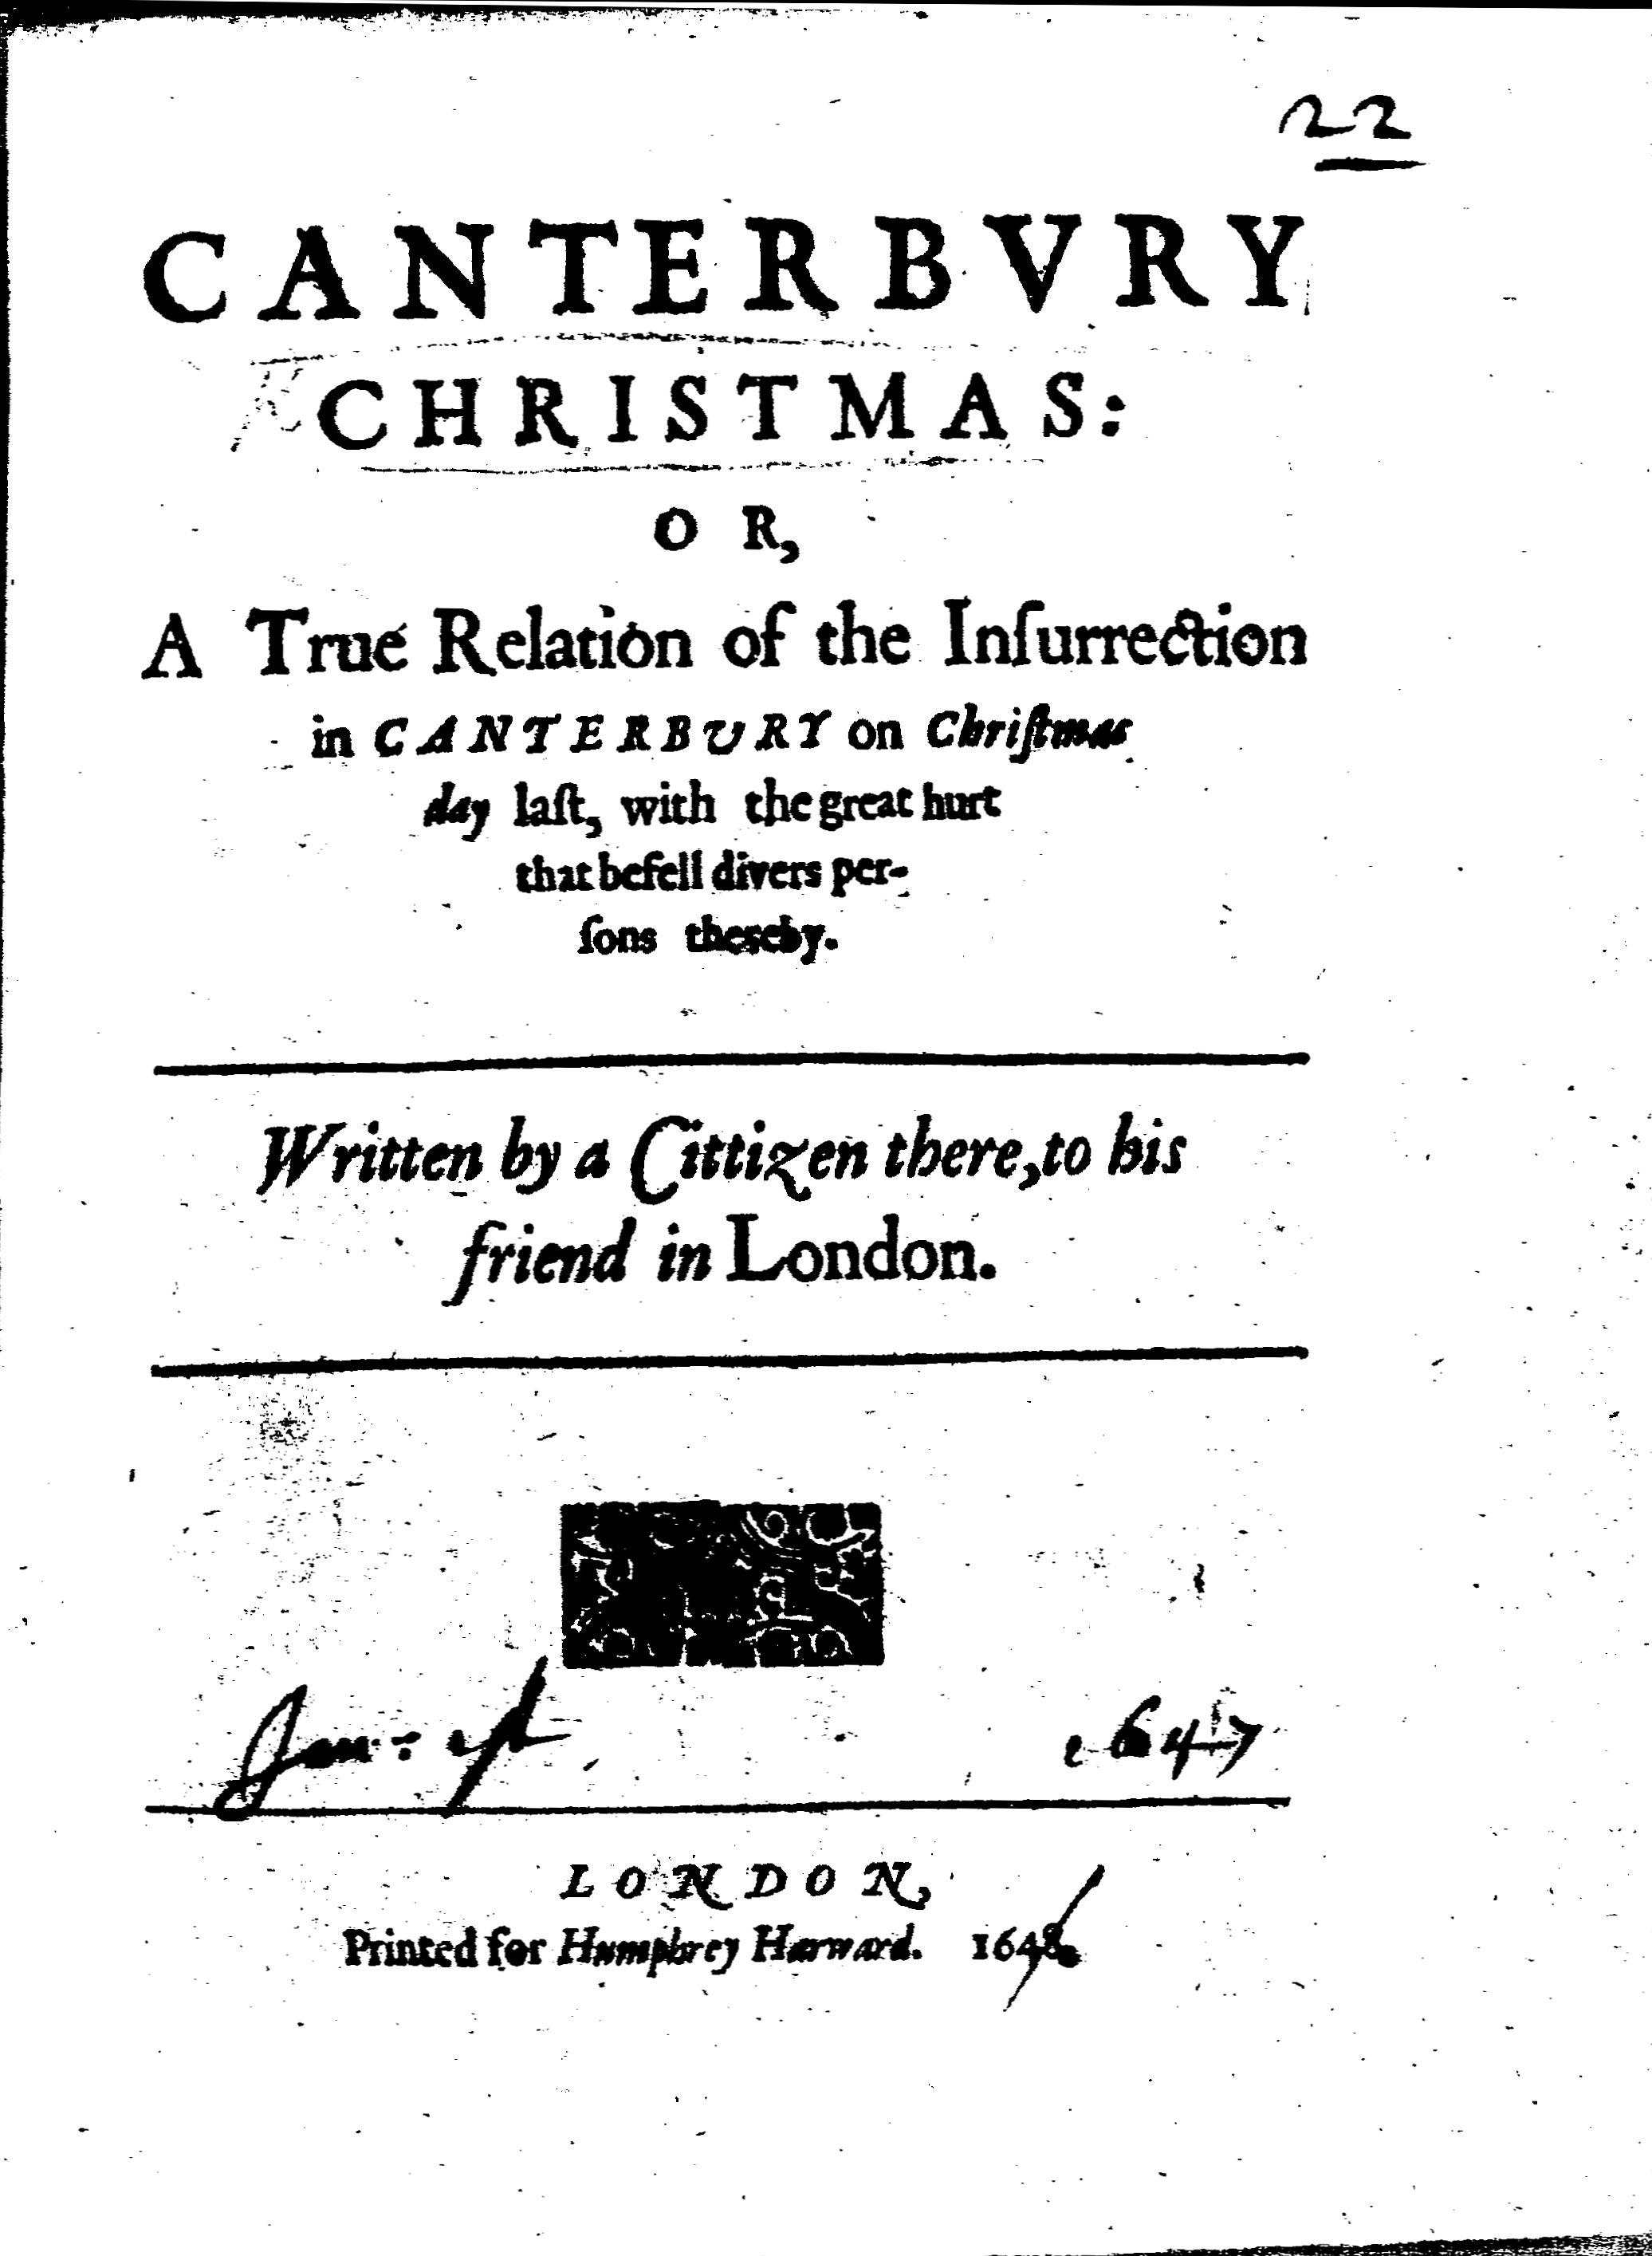 anon-canterbury_christmas-wing-c453-66_e_421_22_-tp